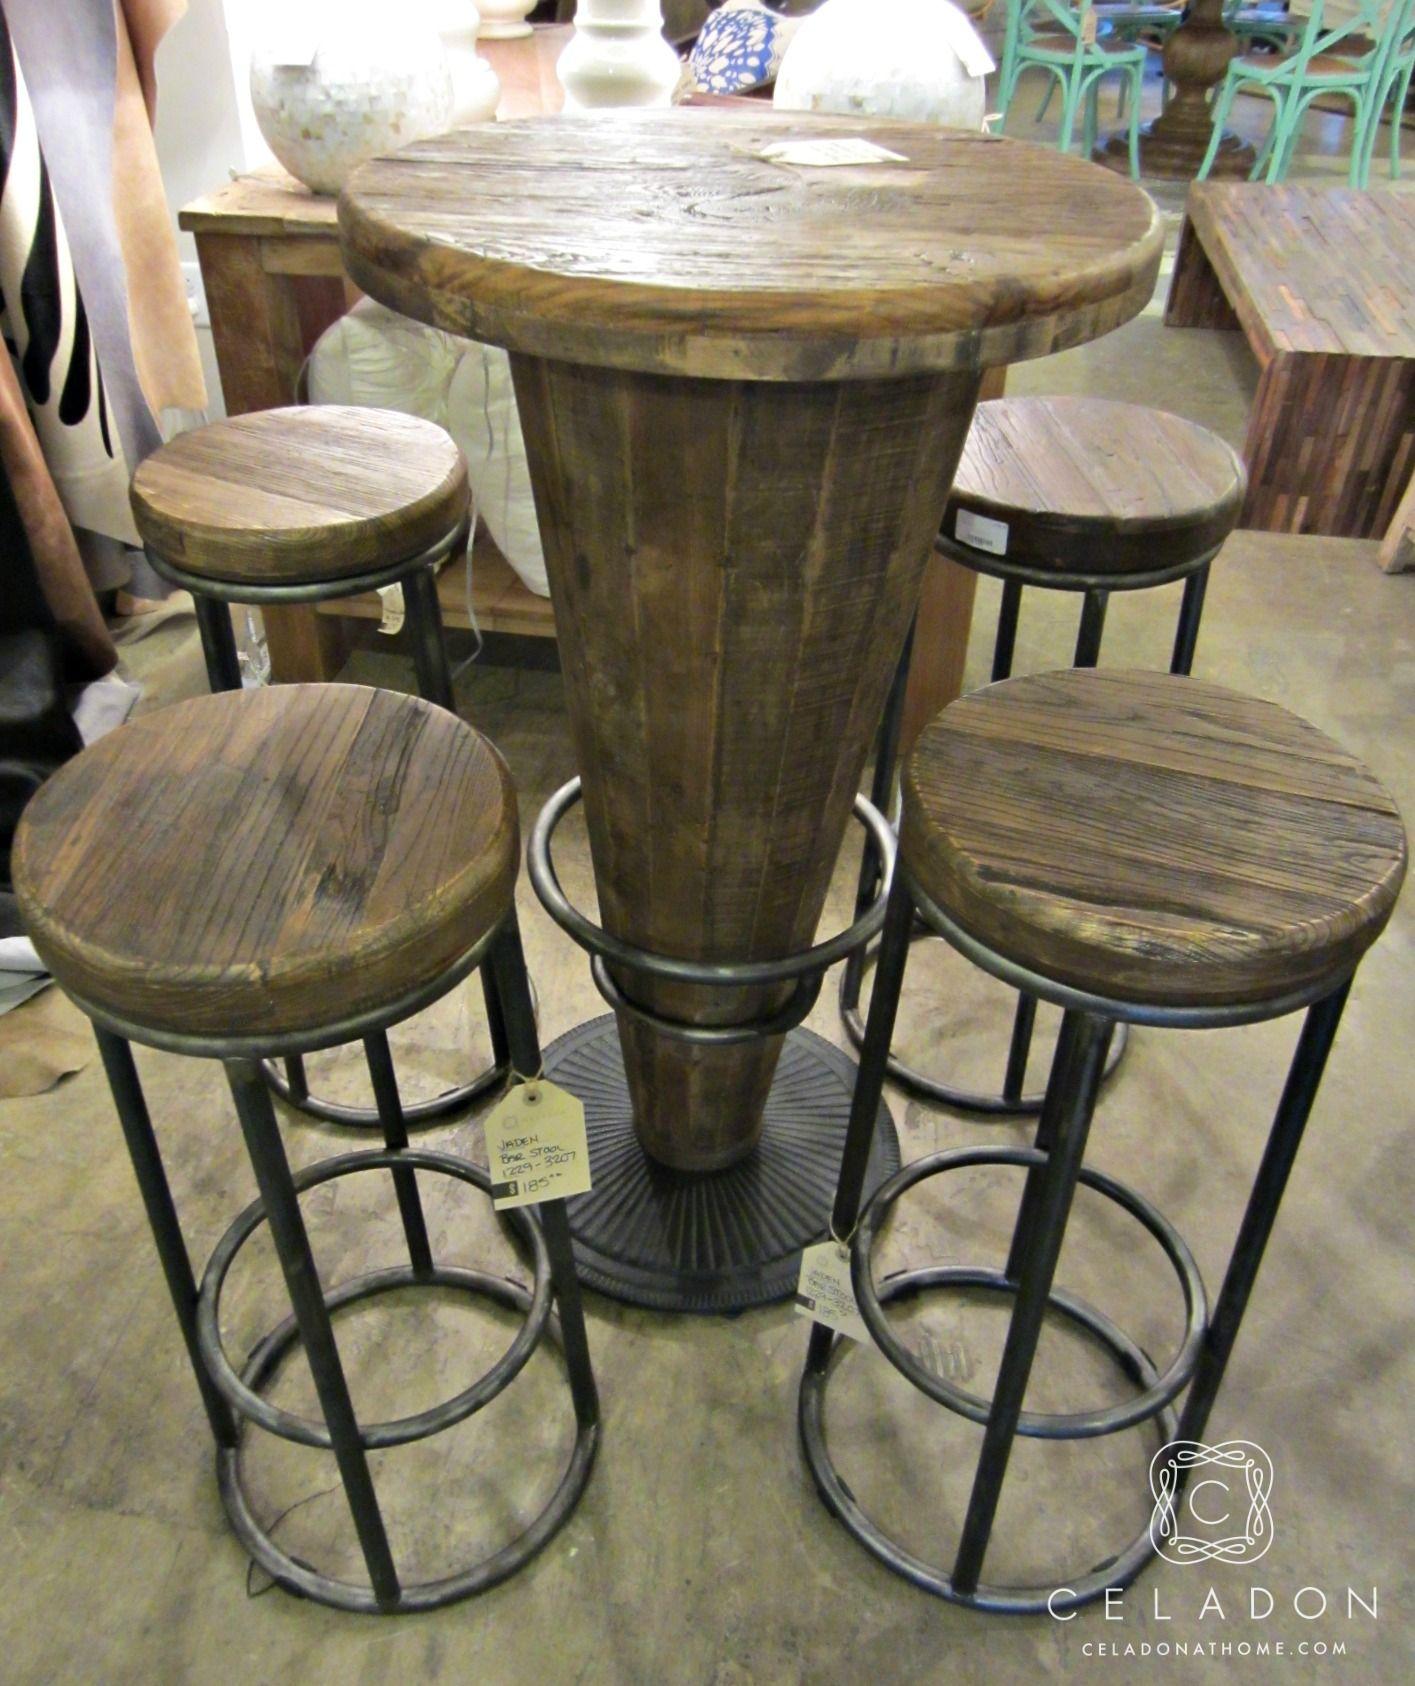 Morella Wood Pub Table 599 1225 51003416 I Celadonathome Com